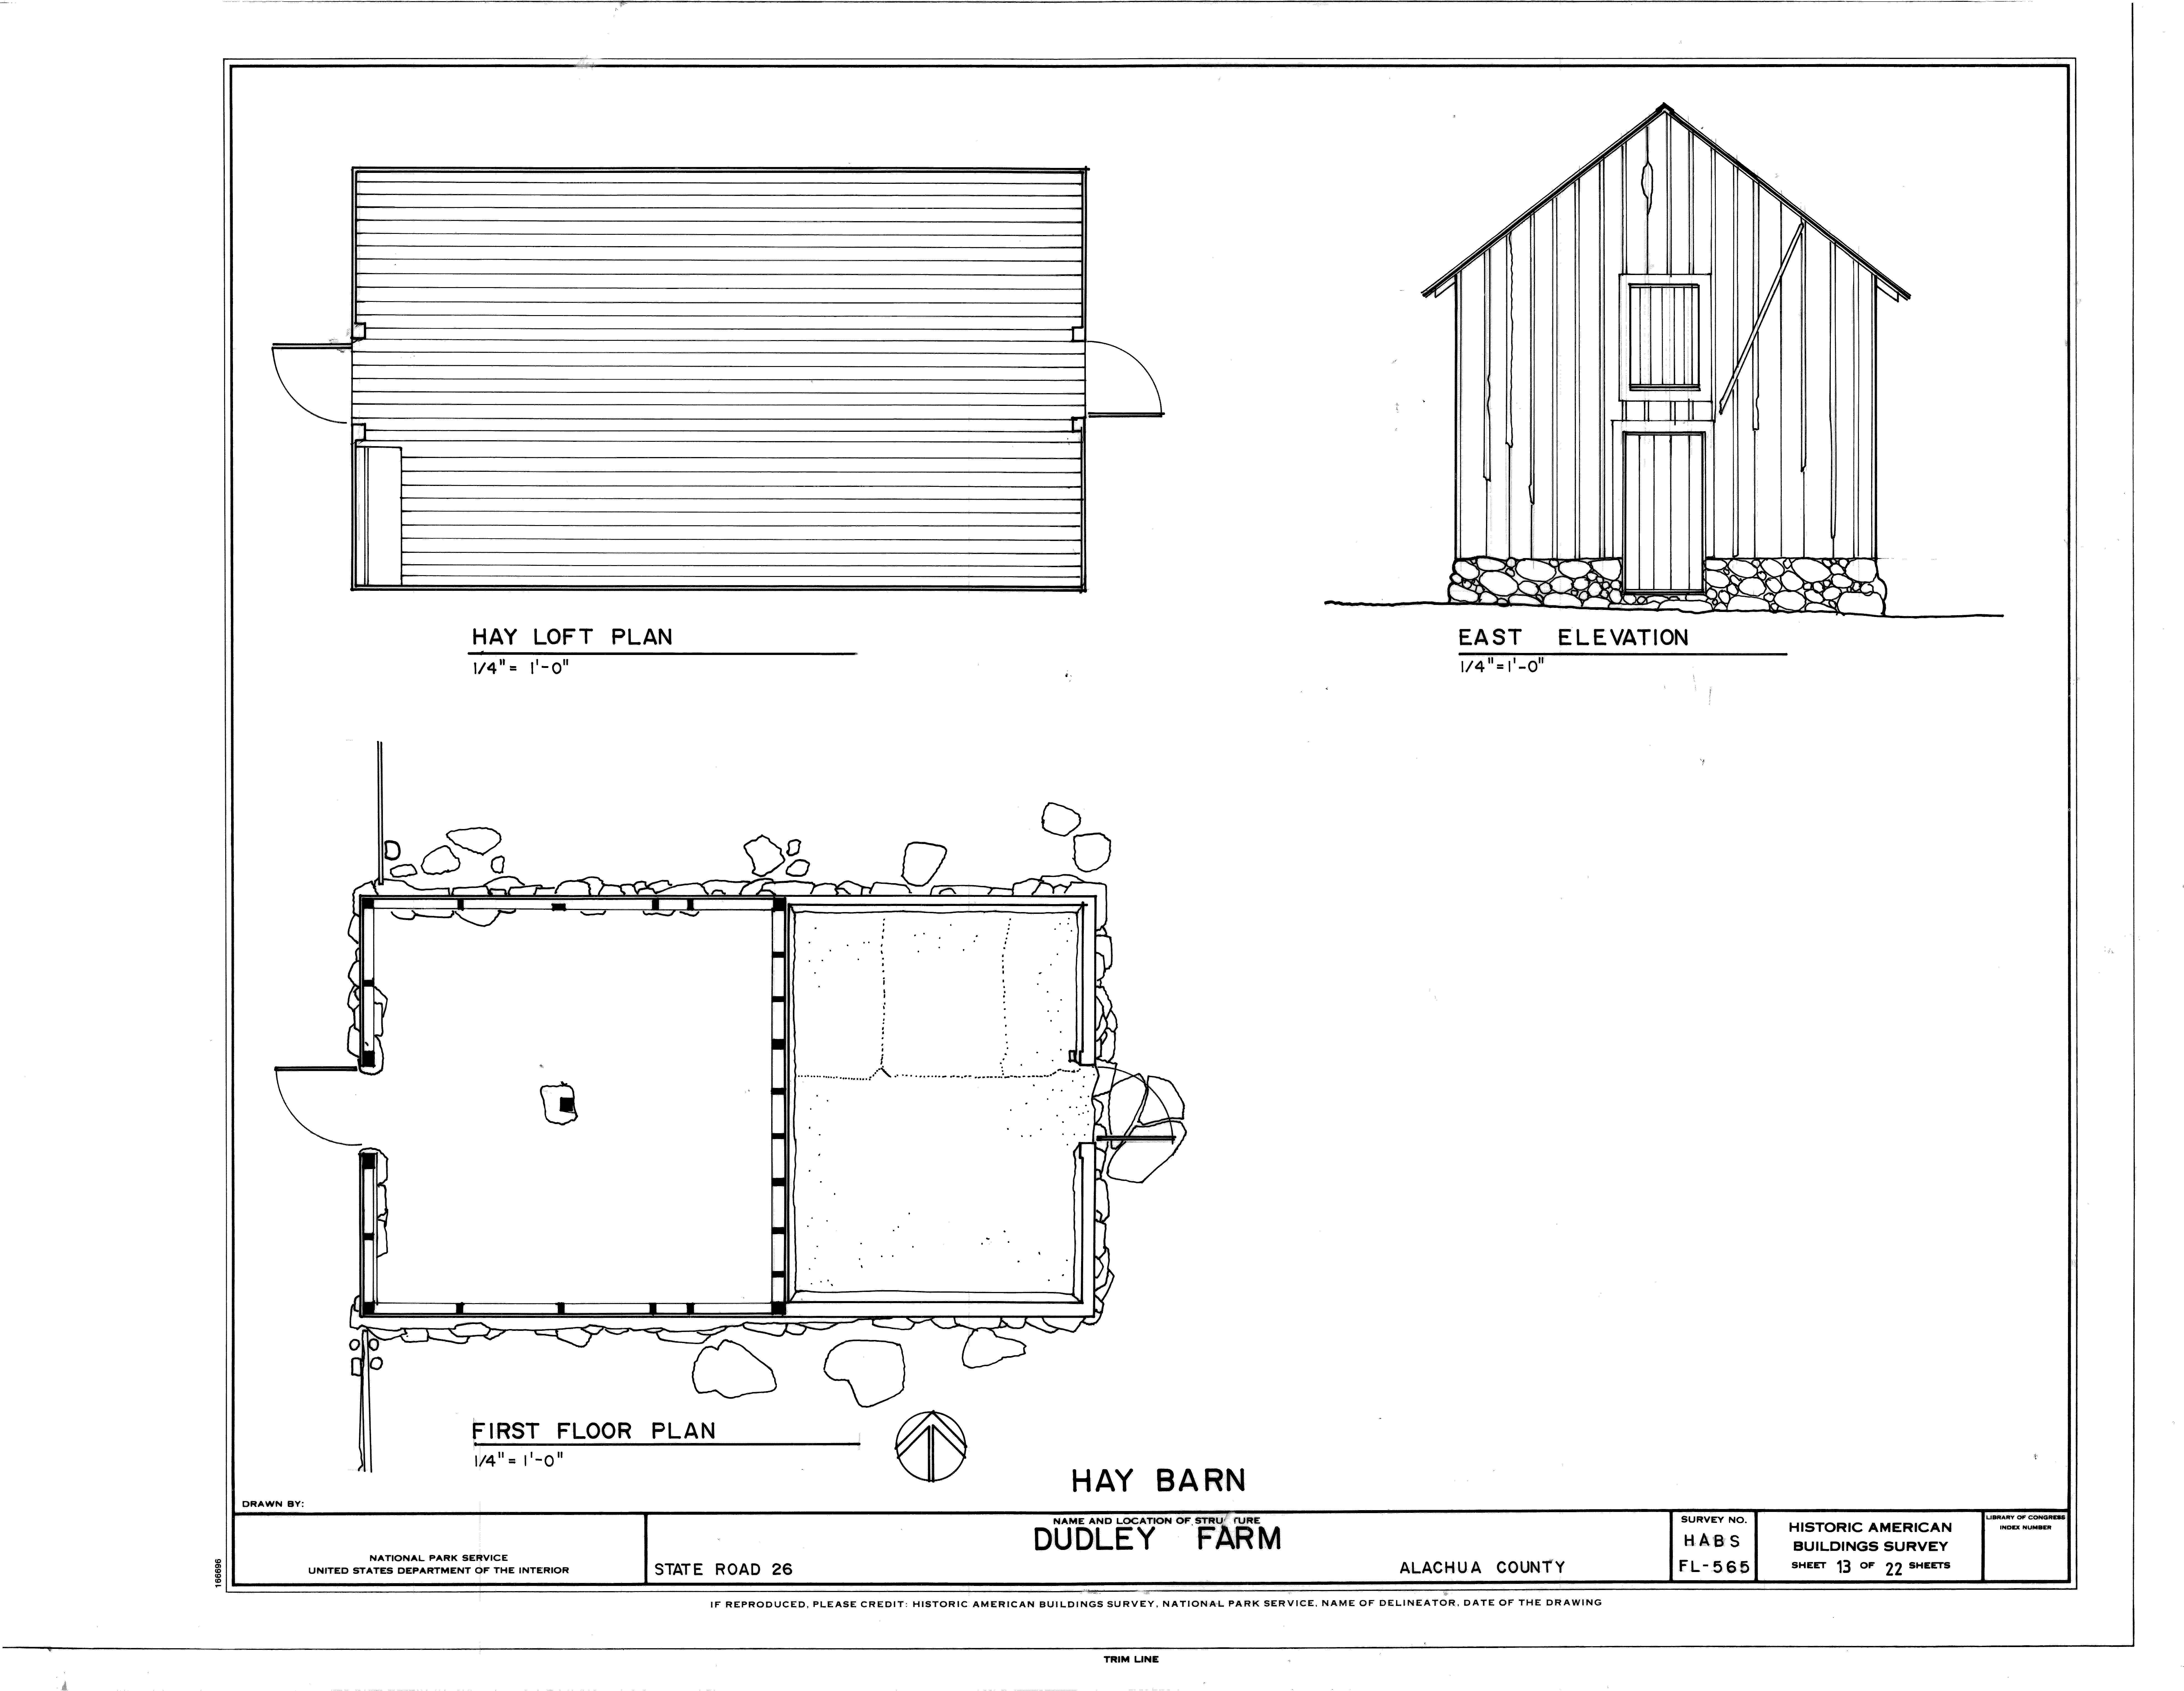 Floor Elevation Measurement : File hay barn east elevation loft plan and first